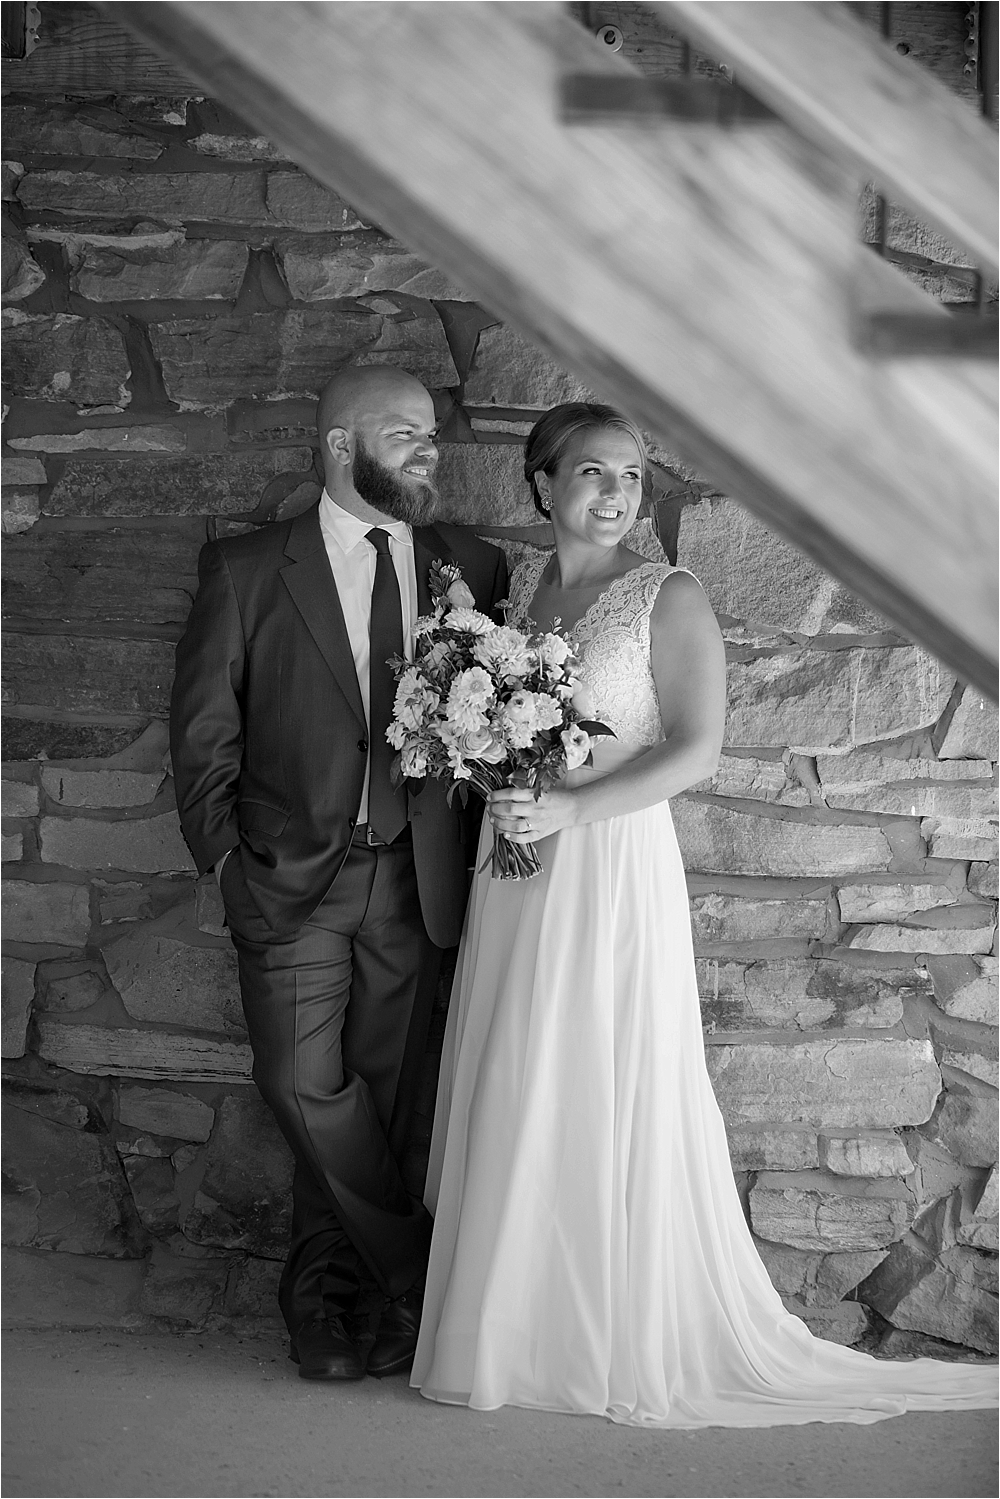 Laura + Eddie's Planet Bluegrass Colorado Wedding_0012.jpg